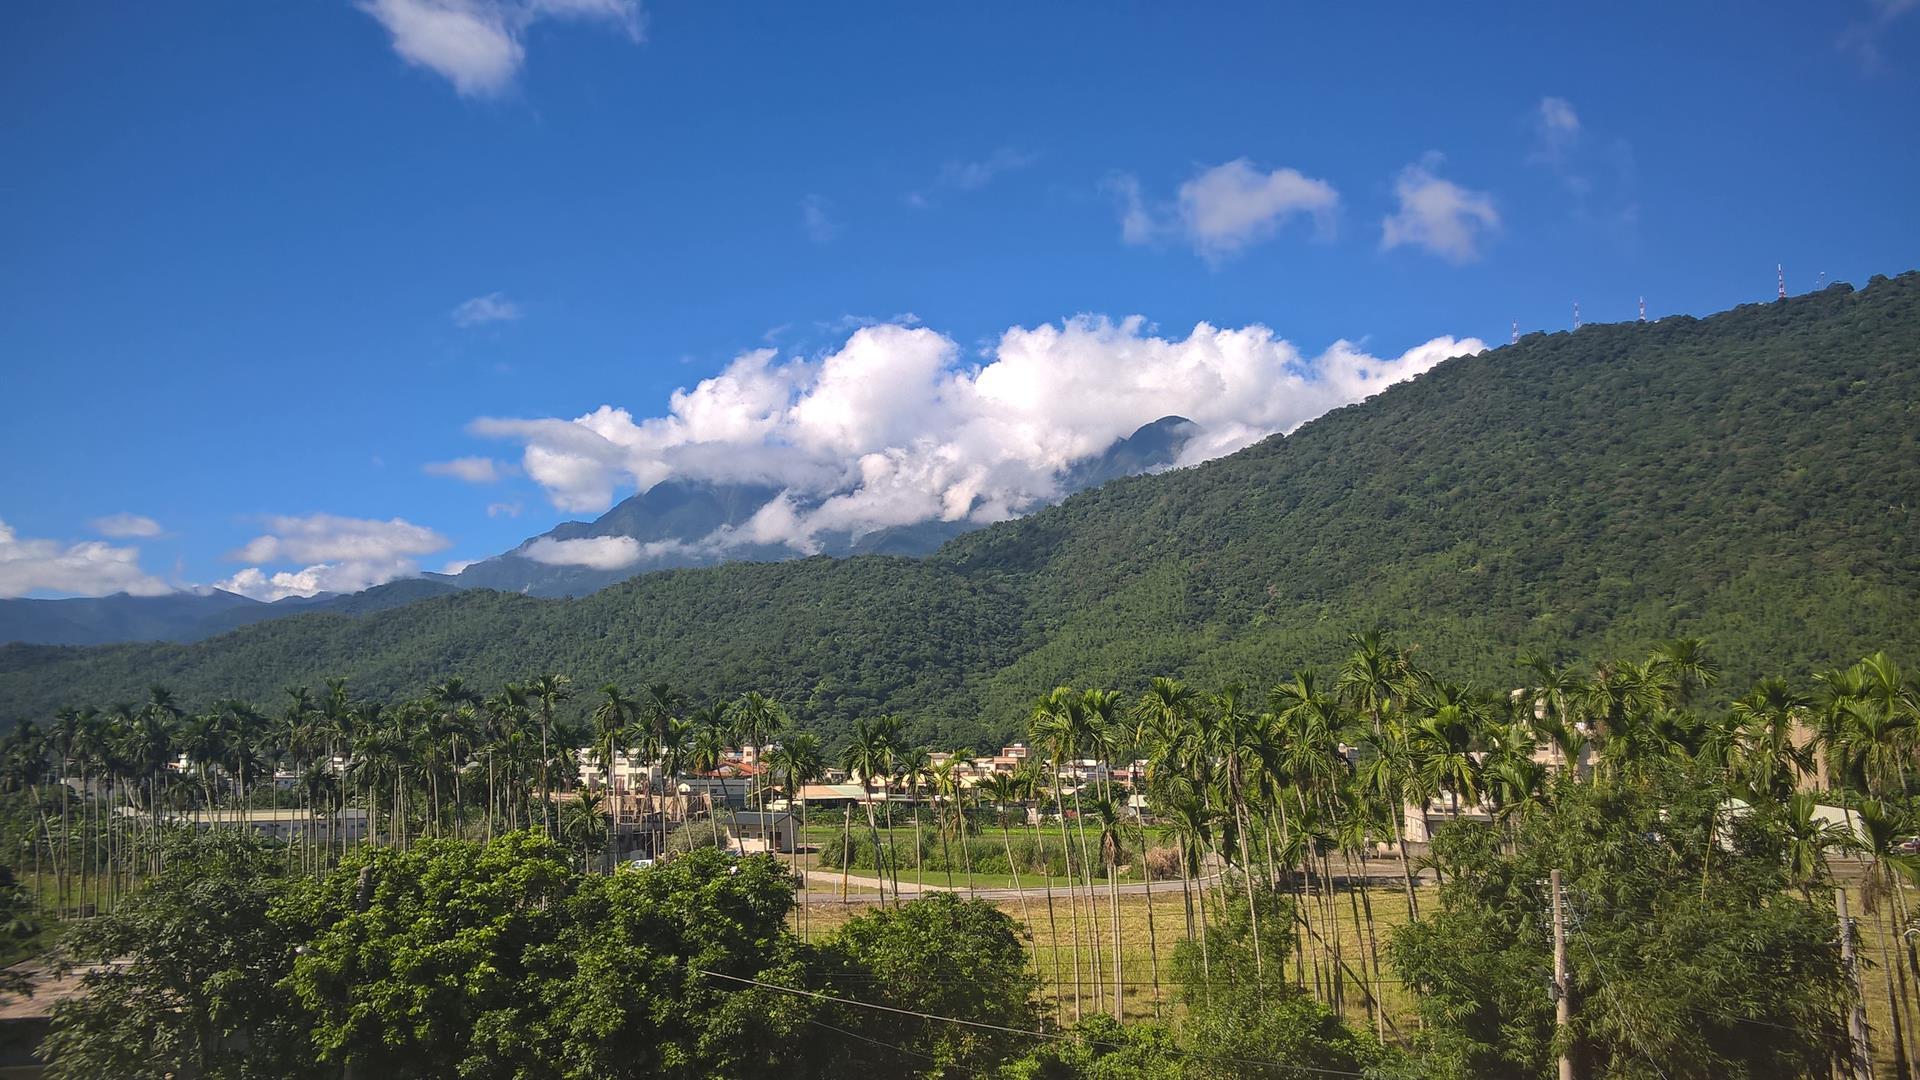 Mein erster Morgen in Hualien